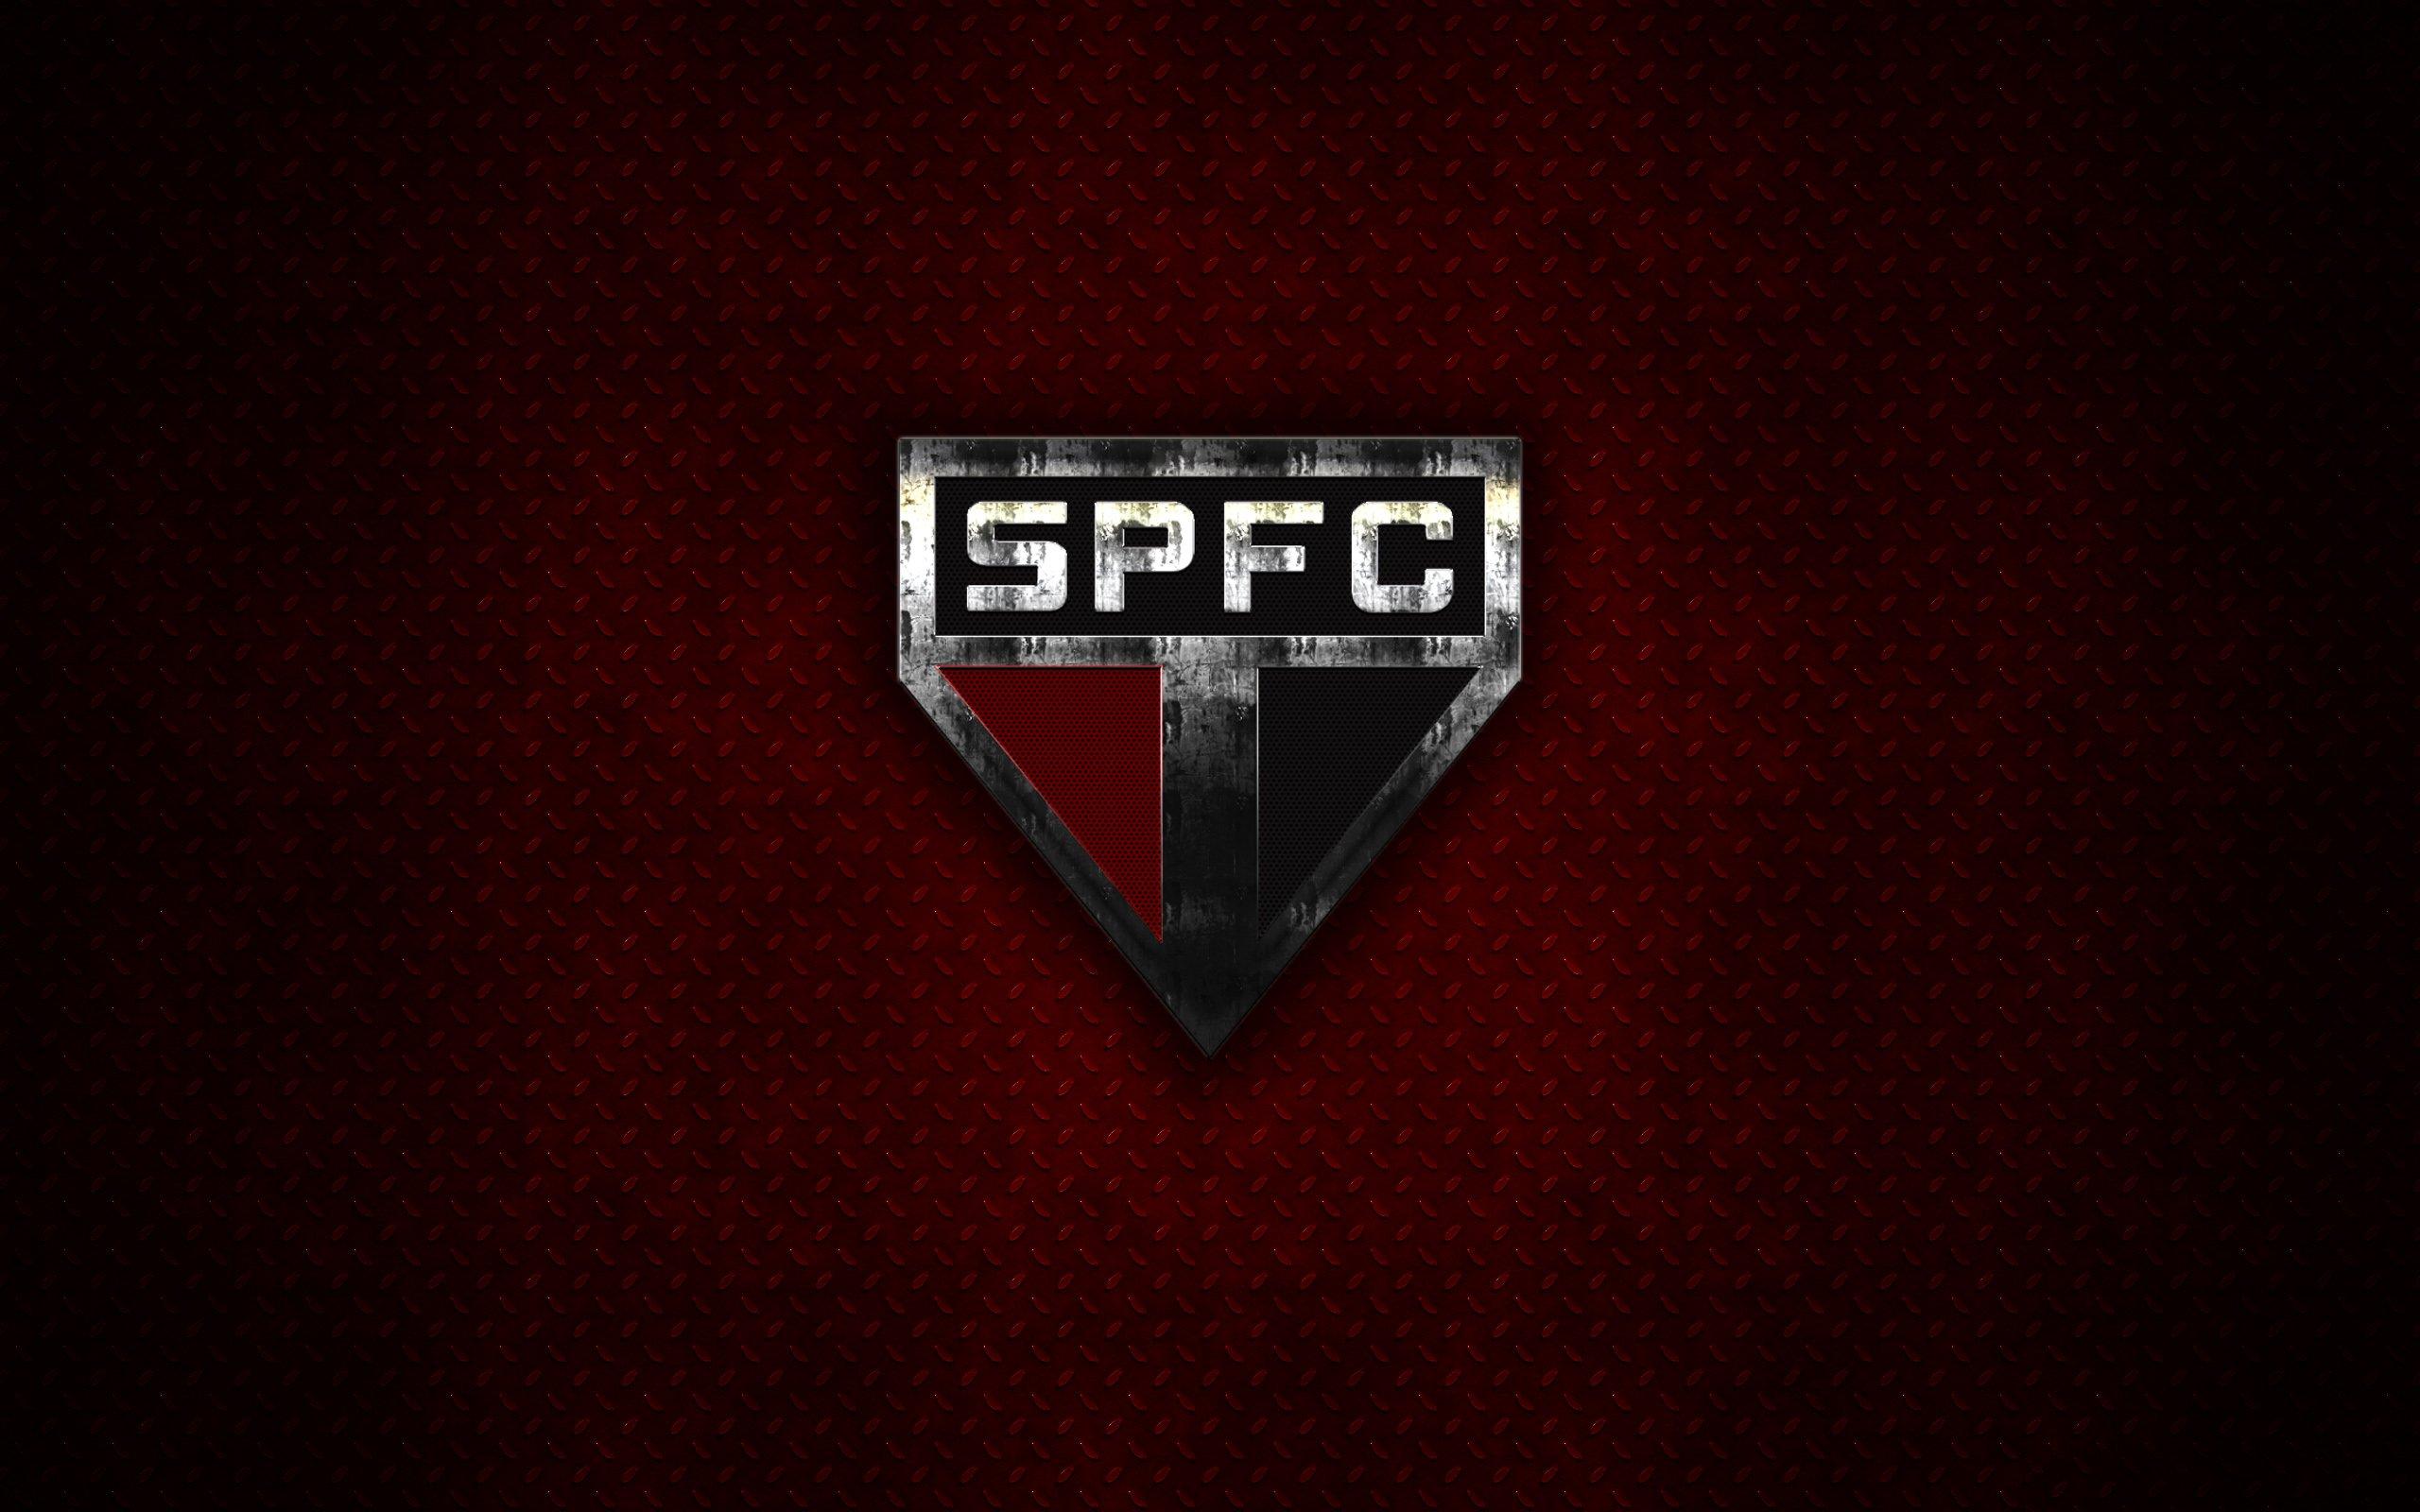 So Paulo FC HD Wallpaper Background Image 2560x1600 ID 2560x1600